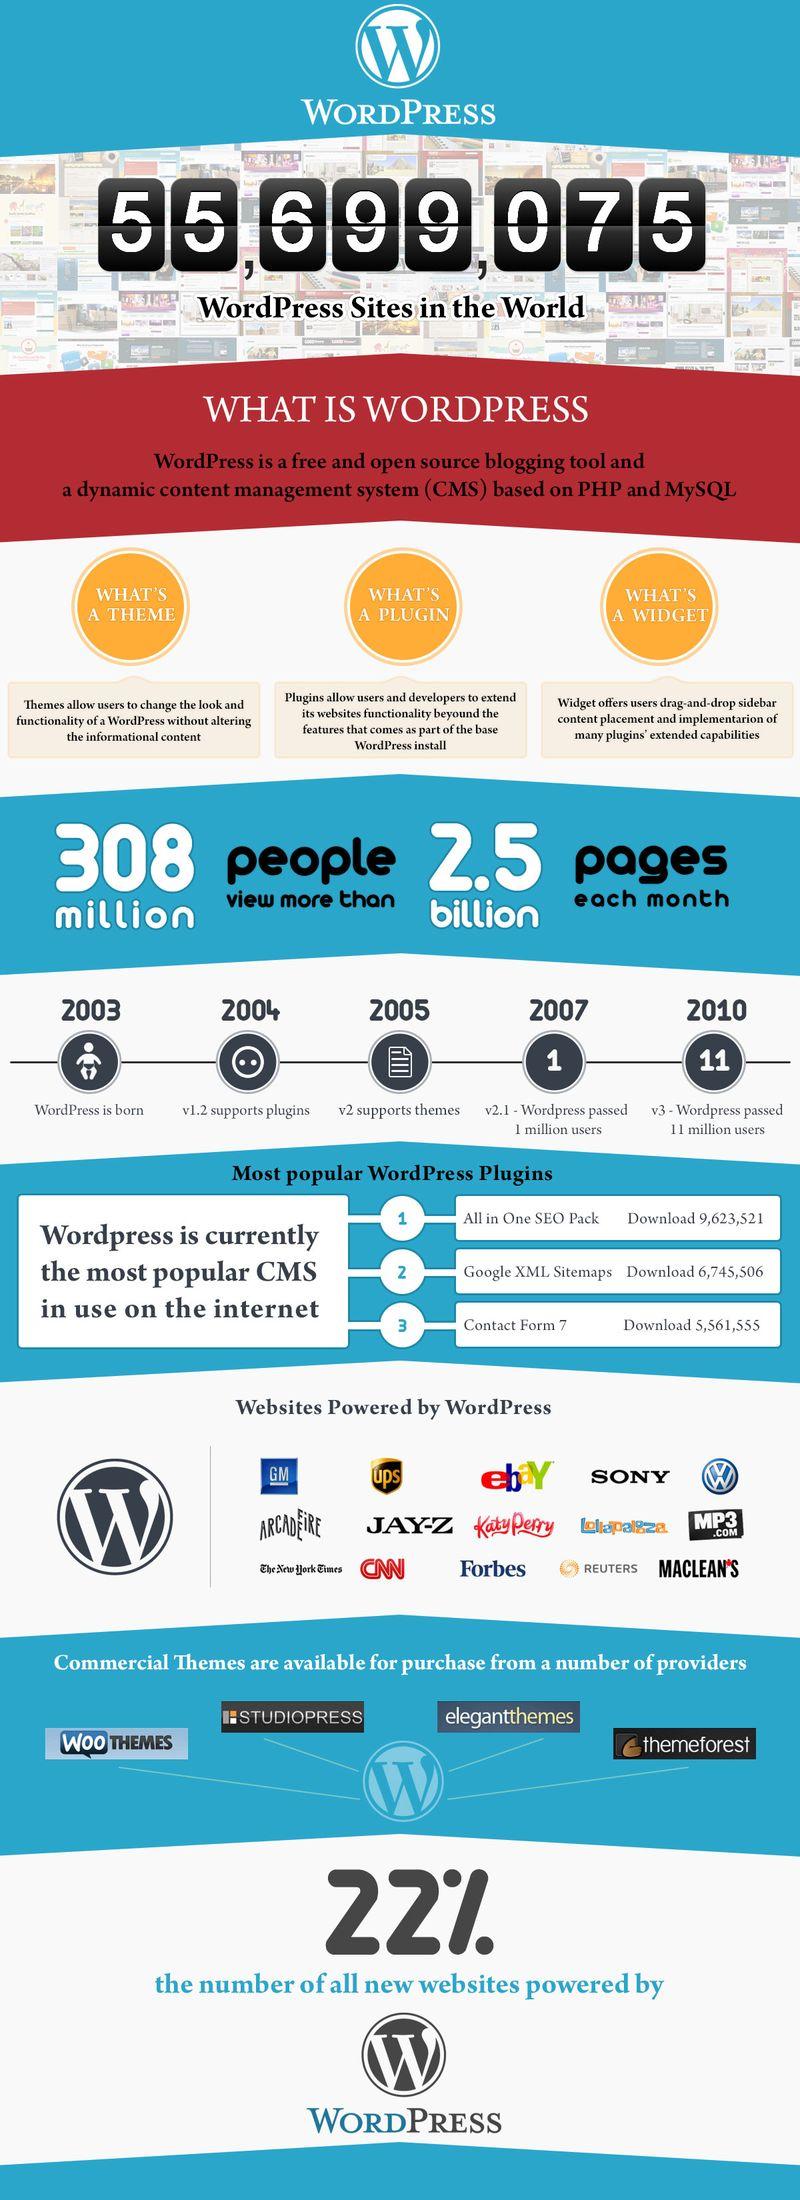 Wordpress-sites-in-the-world